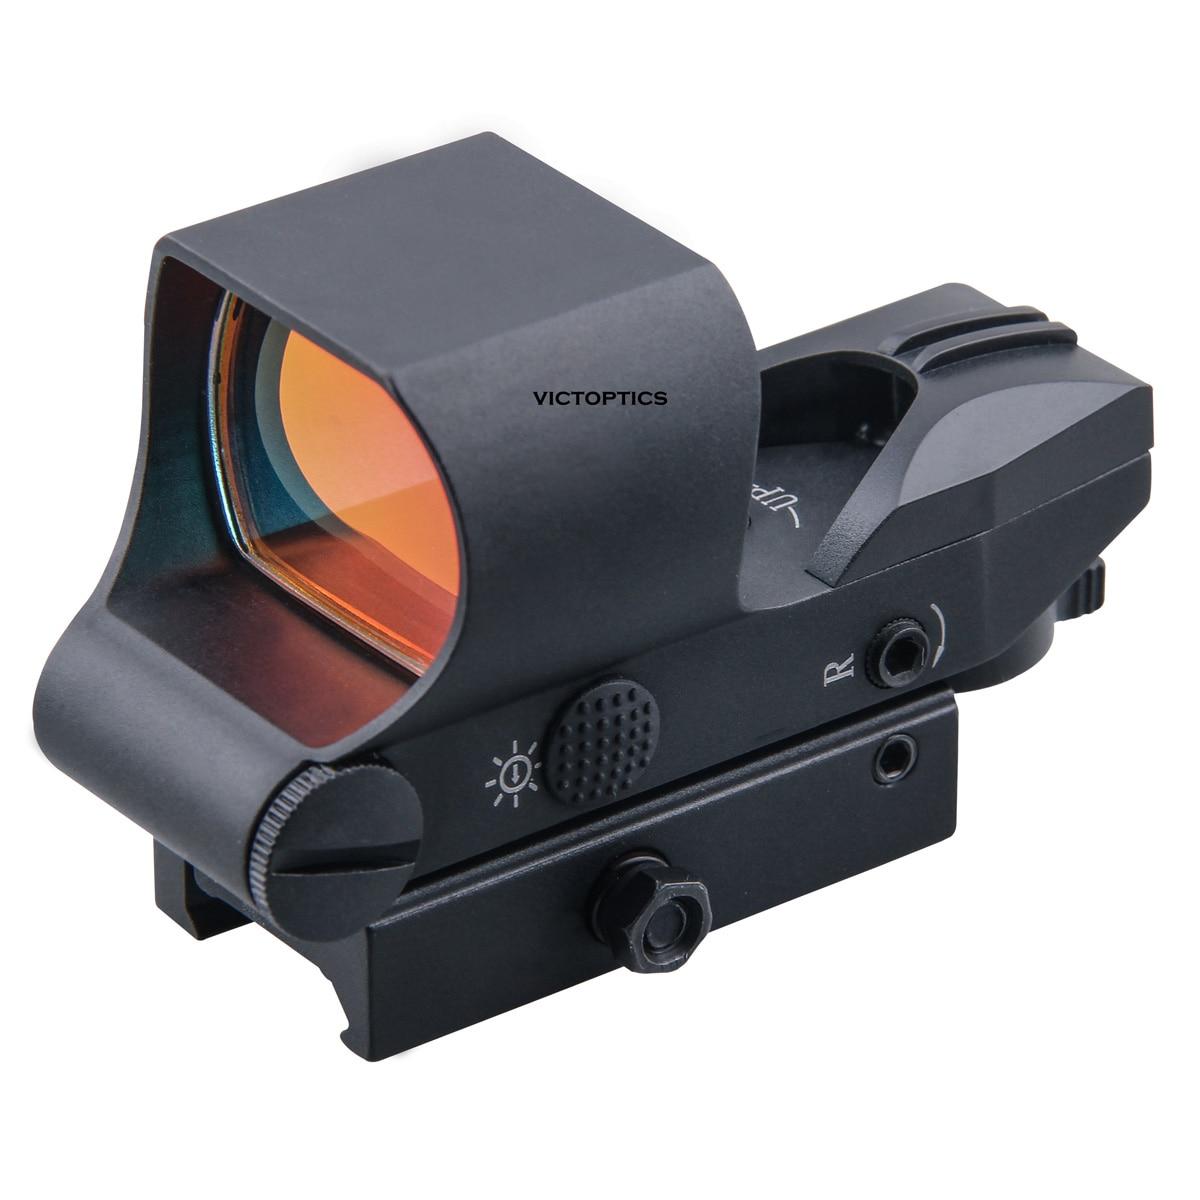 Victoptics 1x28x40 شبكاني قفل نظام التكتيكية ريد دوت نطاق جهاز الرؤية العاكس 21 مللي متر QD Picatinny جبل 6 مستويات